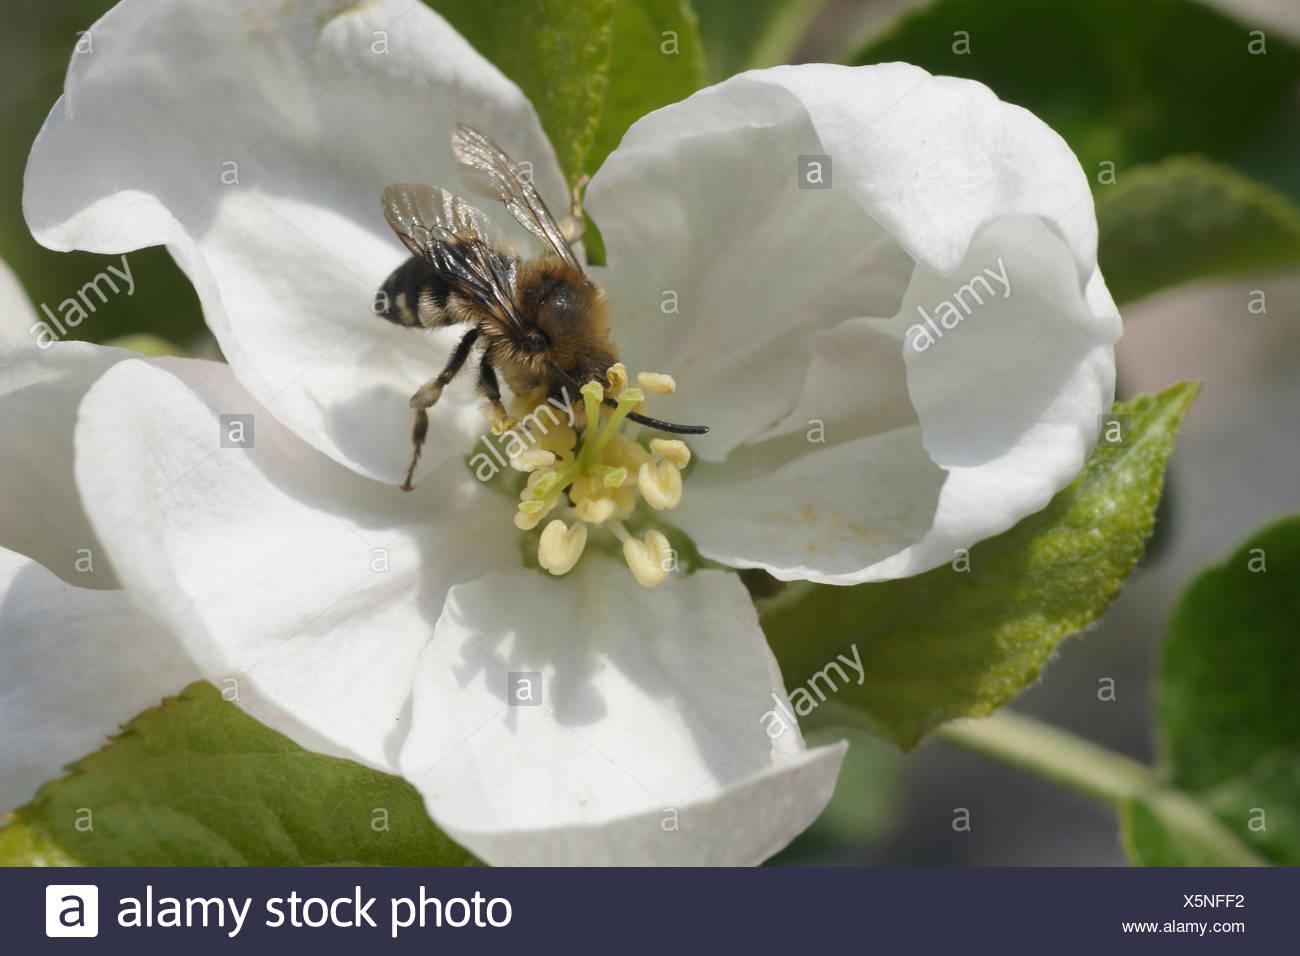 Malus domestica, Apple, Wild Bee - Stock Image